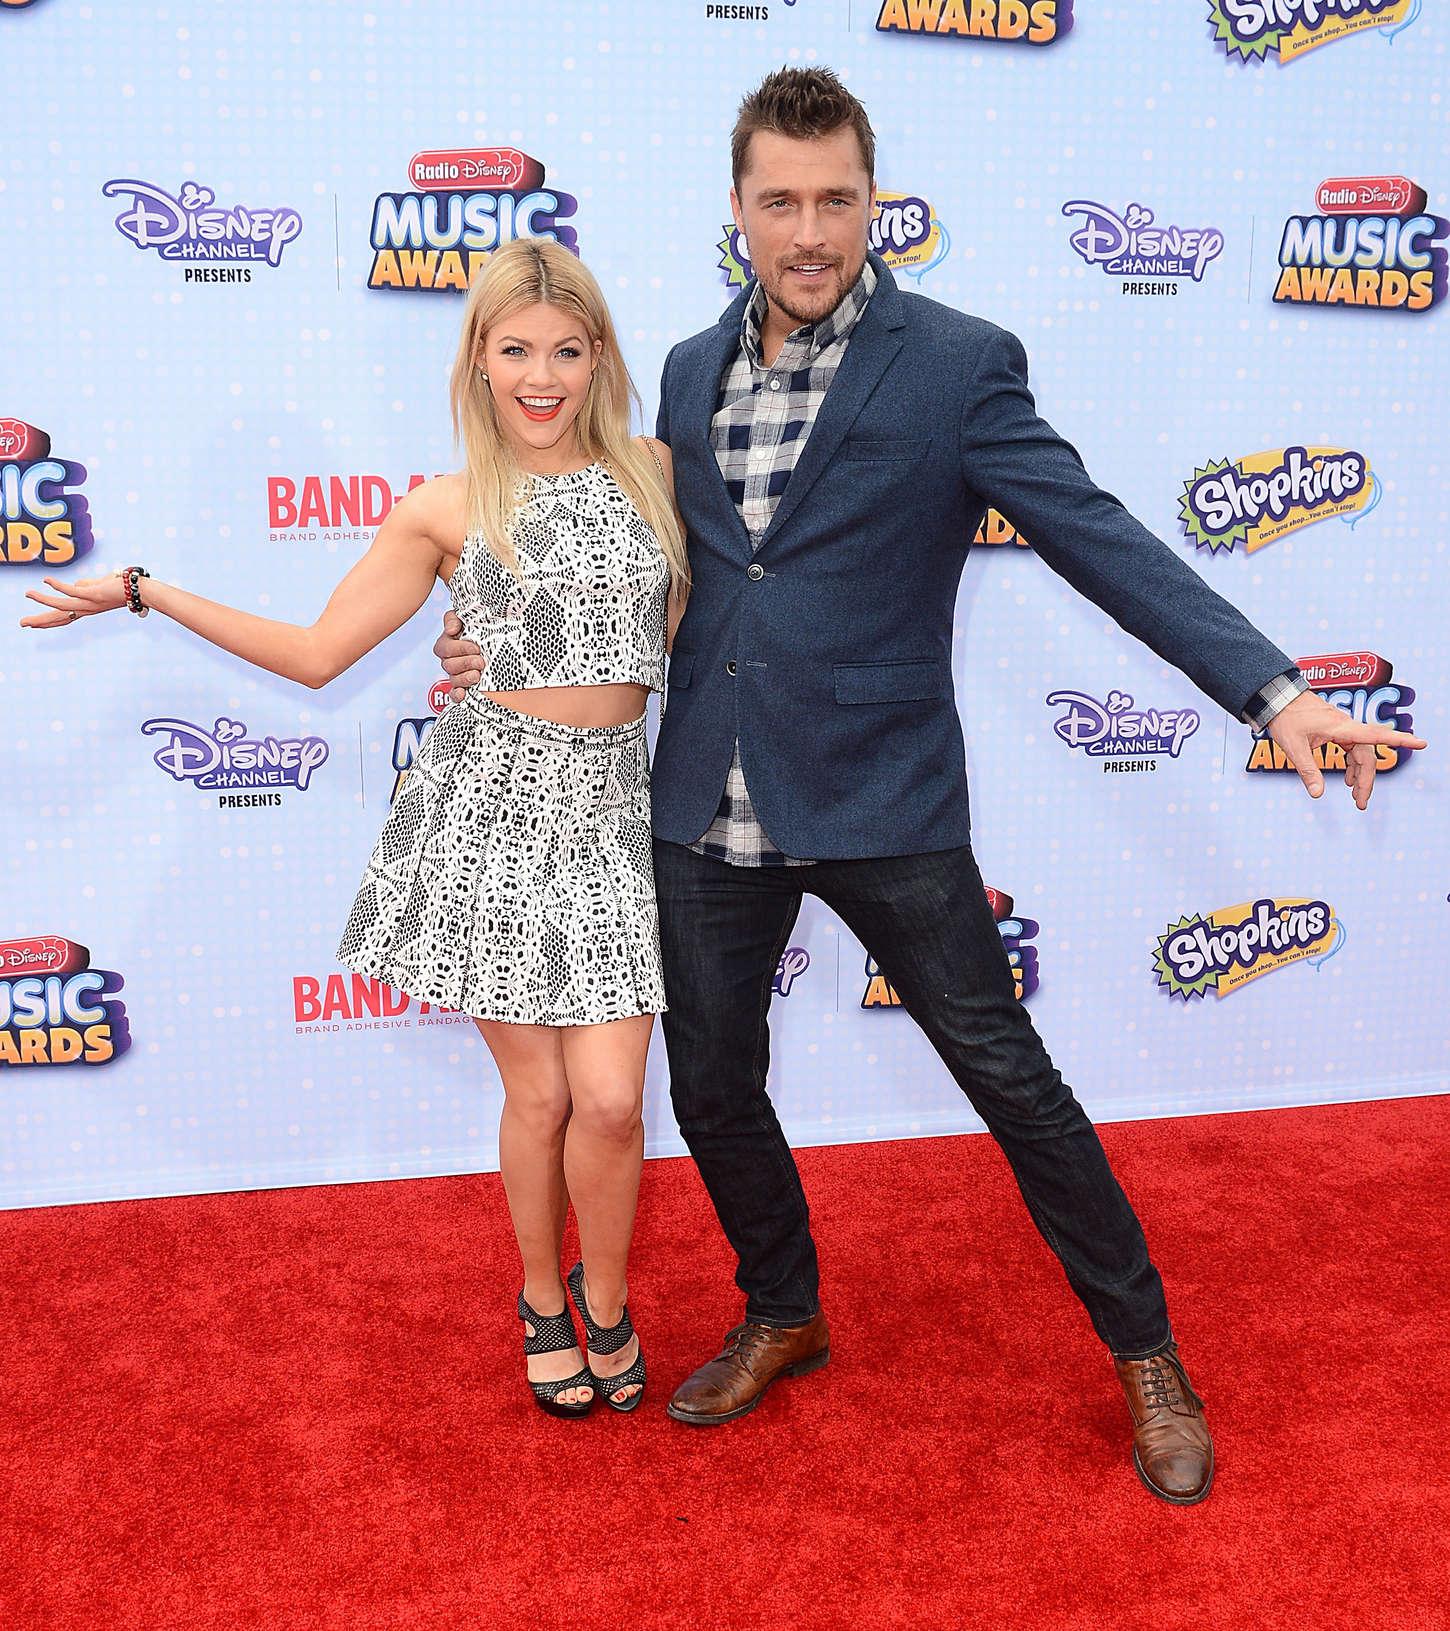 Witney Carson 2015 : Witney Carson: 2015 Radio Disney Music Awards -02